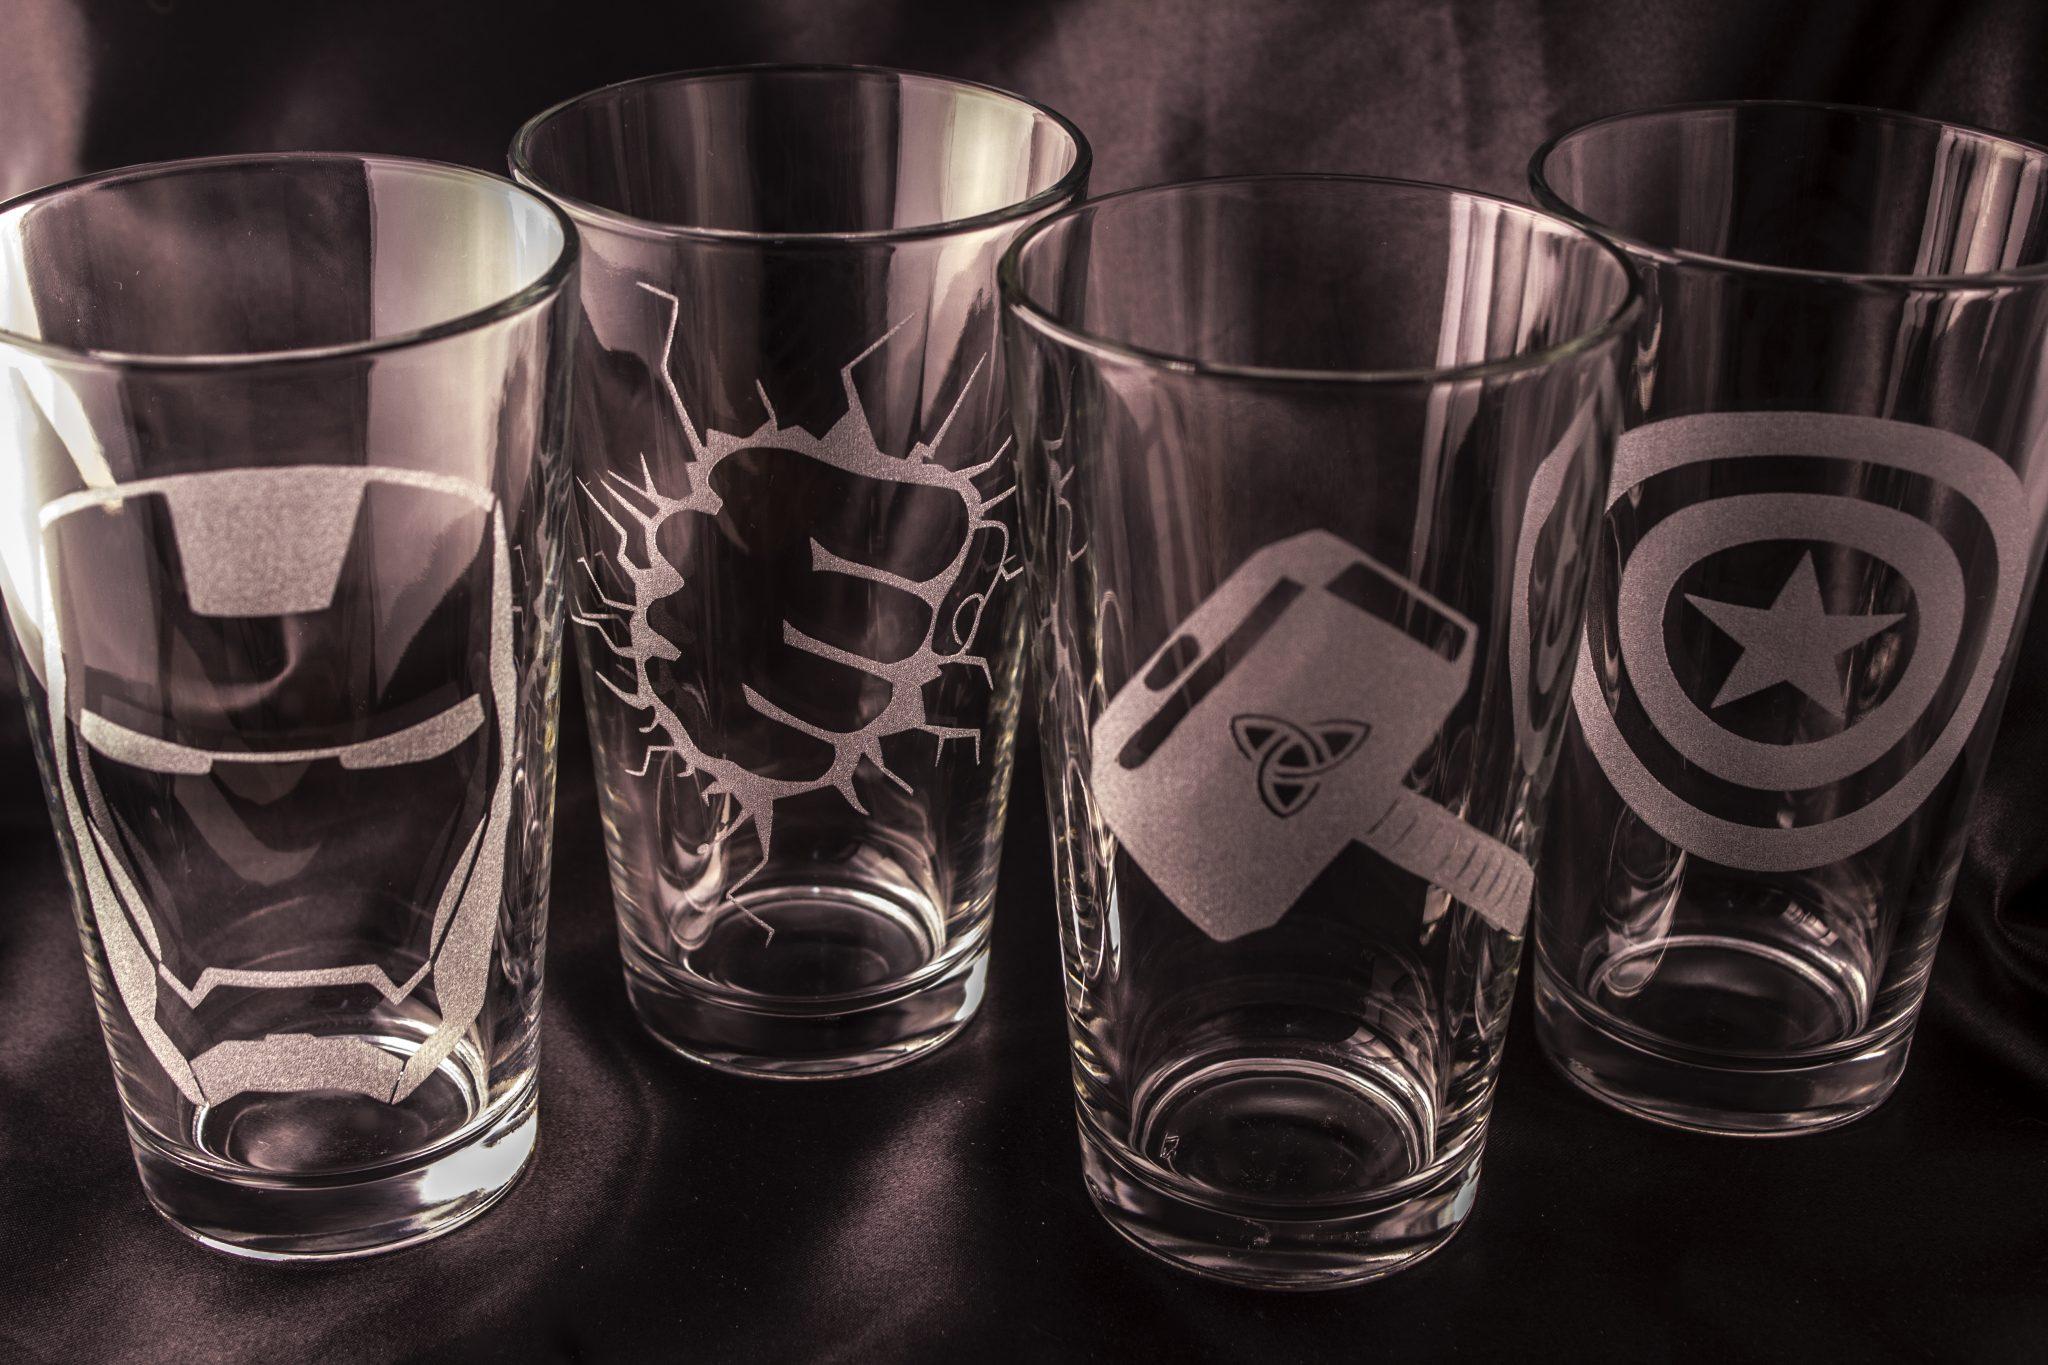 Avengers Pint Glass.